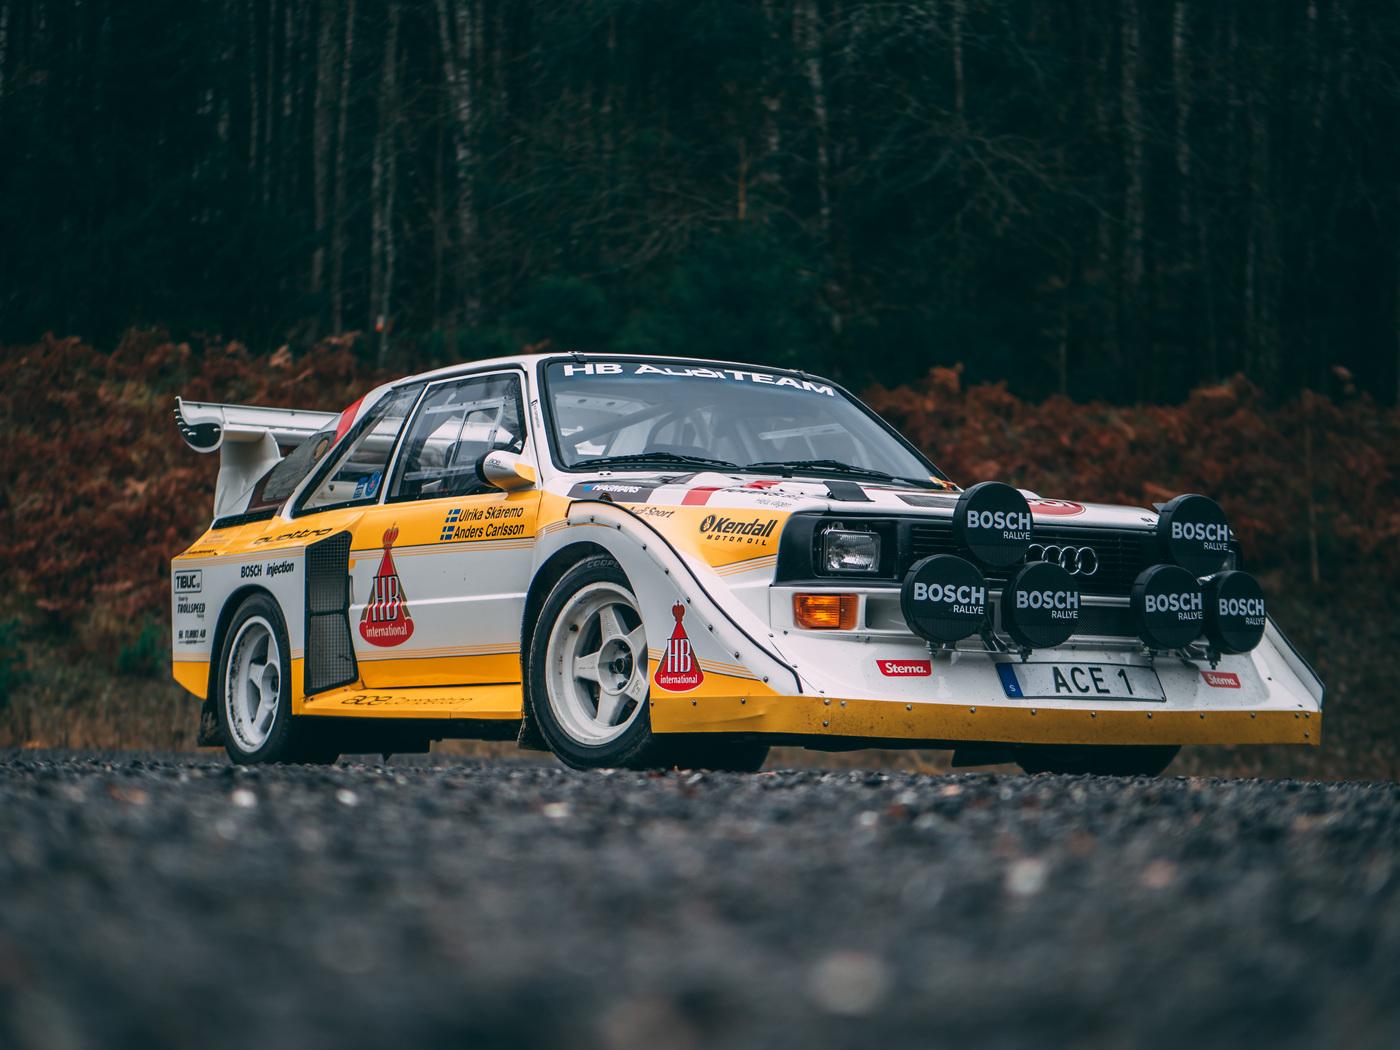 Mike Eriksson - AUDI sport s1 - ur quattro  S1 E2 - photoshoot.